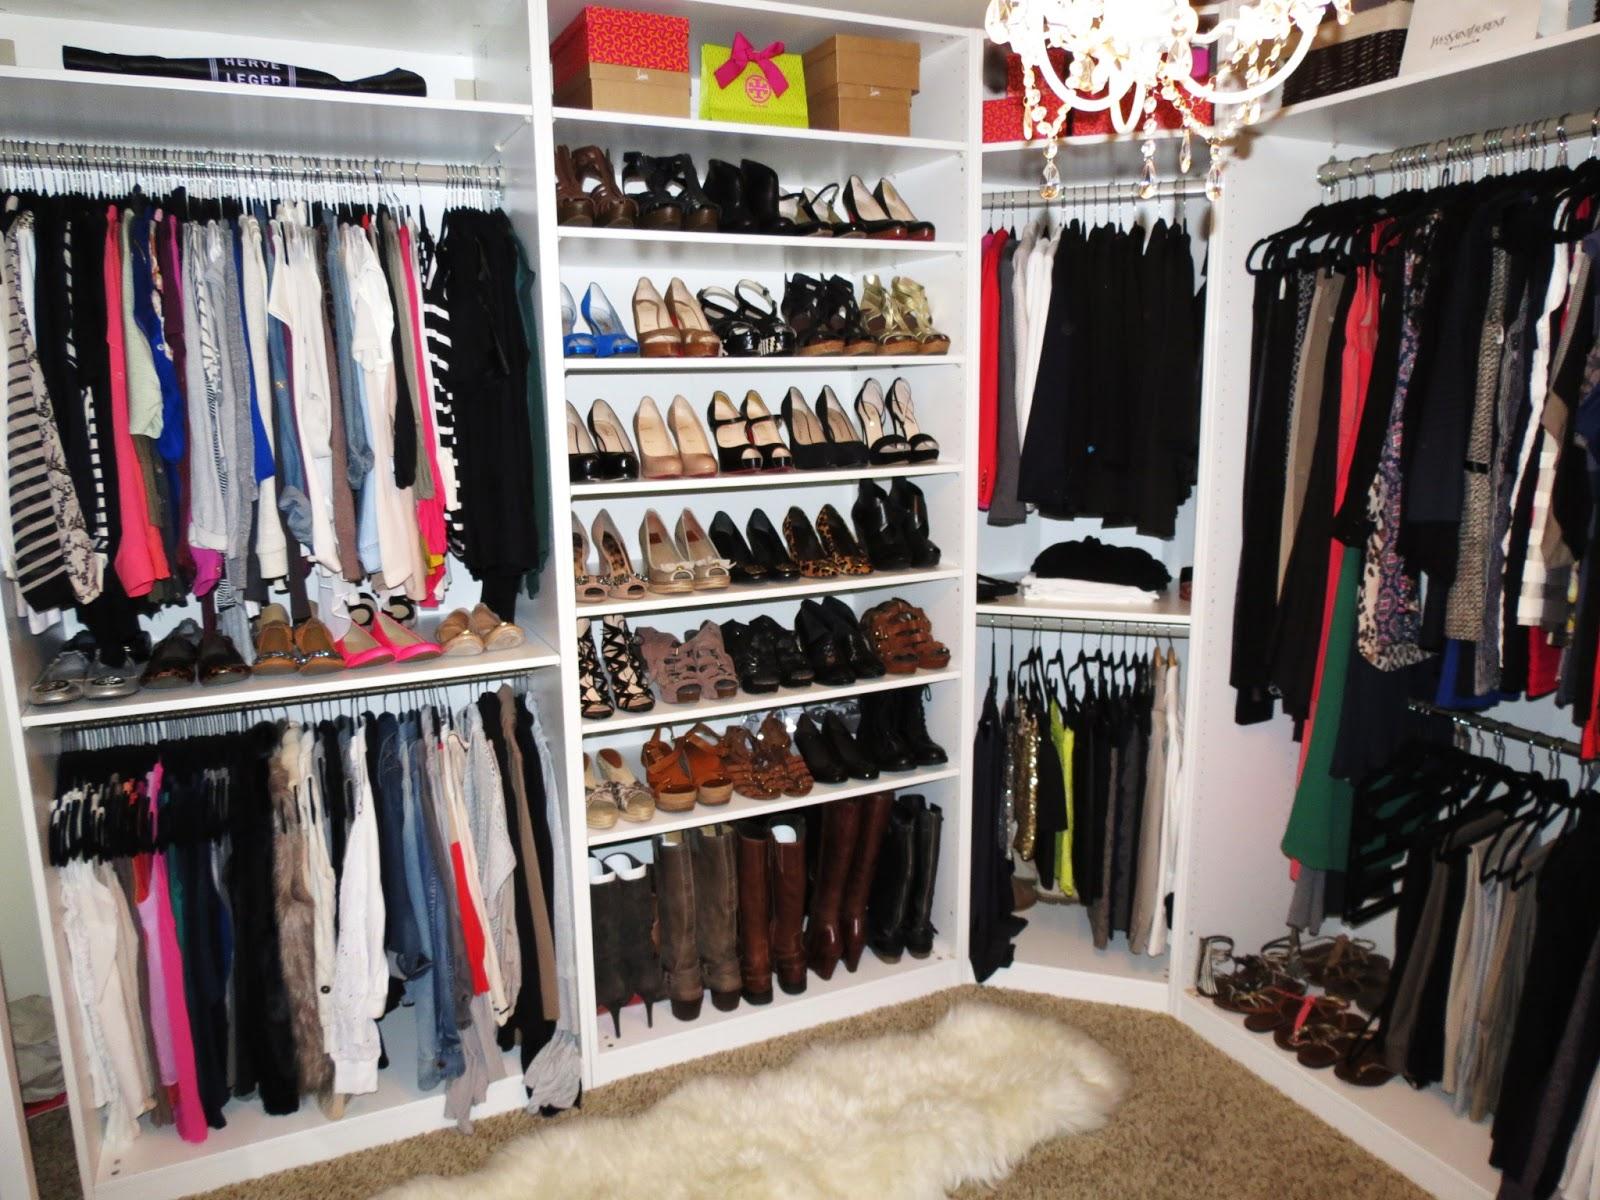 Ordinaire This Closet Has Been A Long Time Cominu0027.